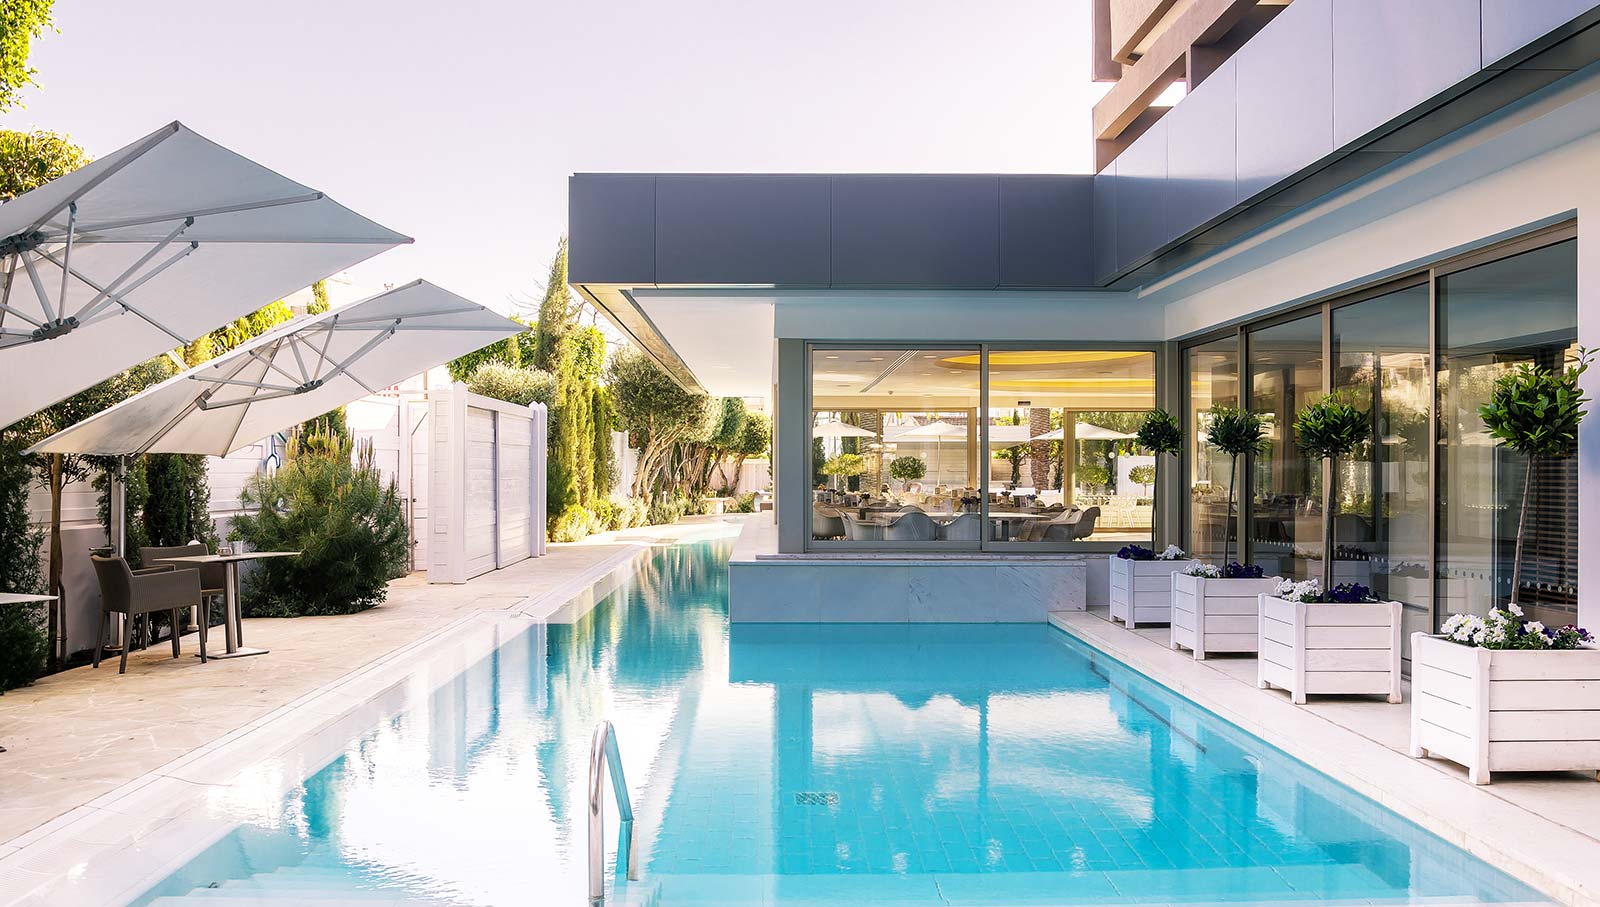 Alasia Boutique Hotel 4-Limassol-Jumbo travel-pool